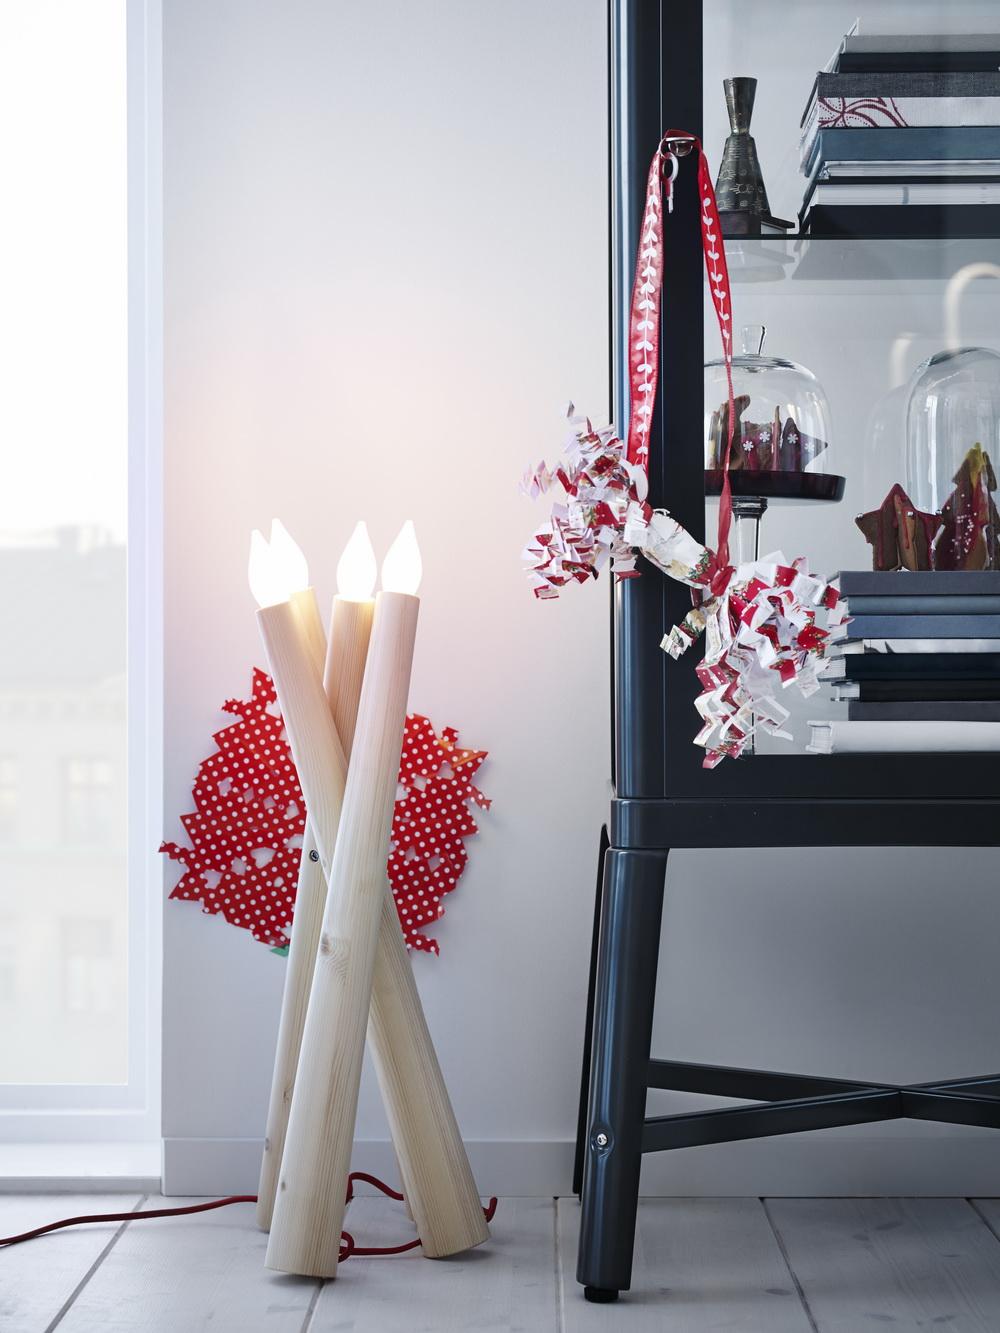 Ikea kari09_resize.jpg